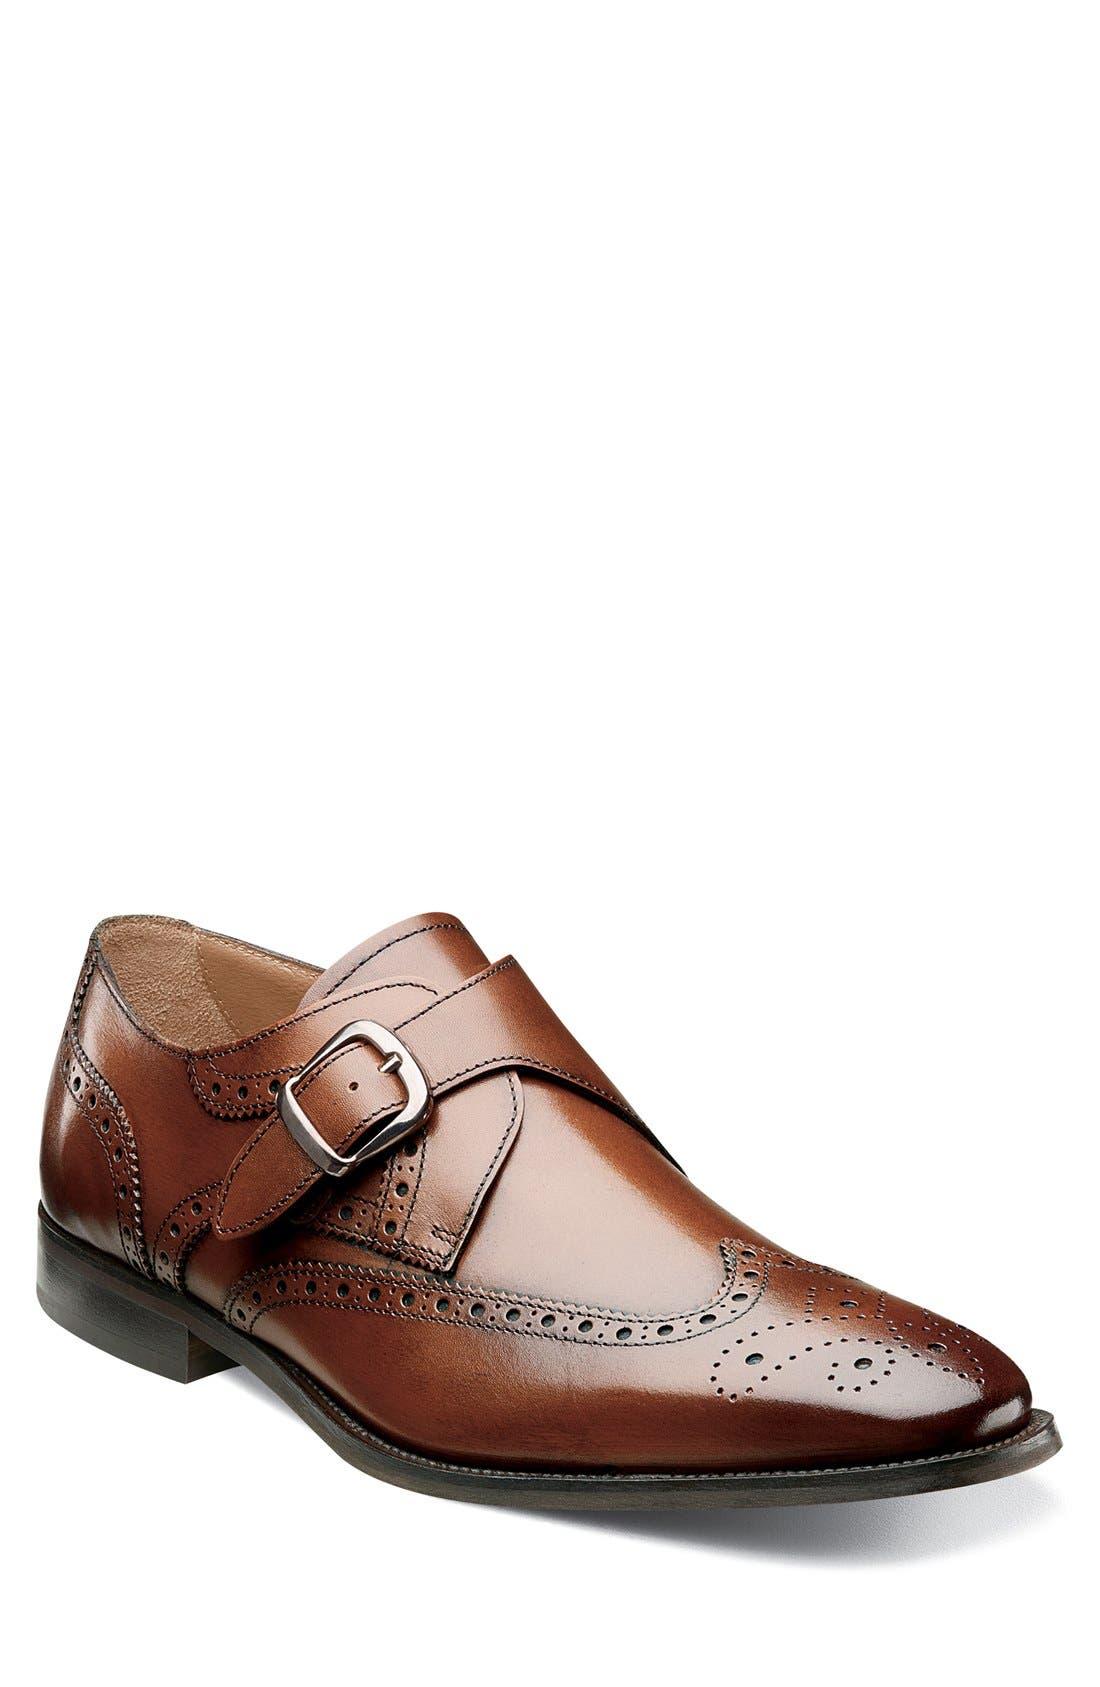 FLORSHEIM 'Sabato' Wingtip Monk Strap Shoe